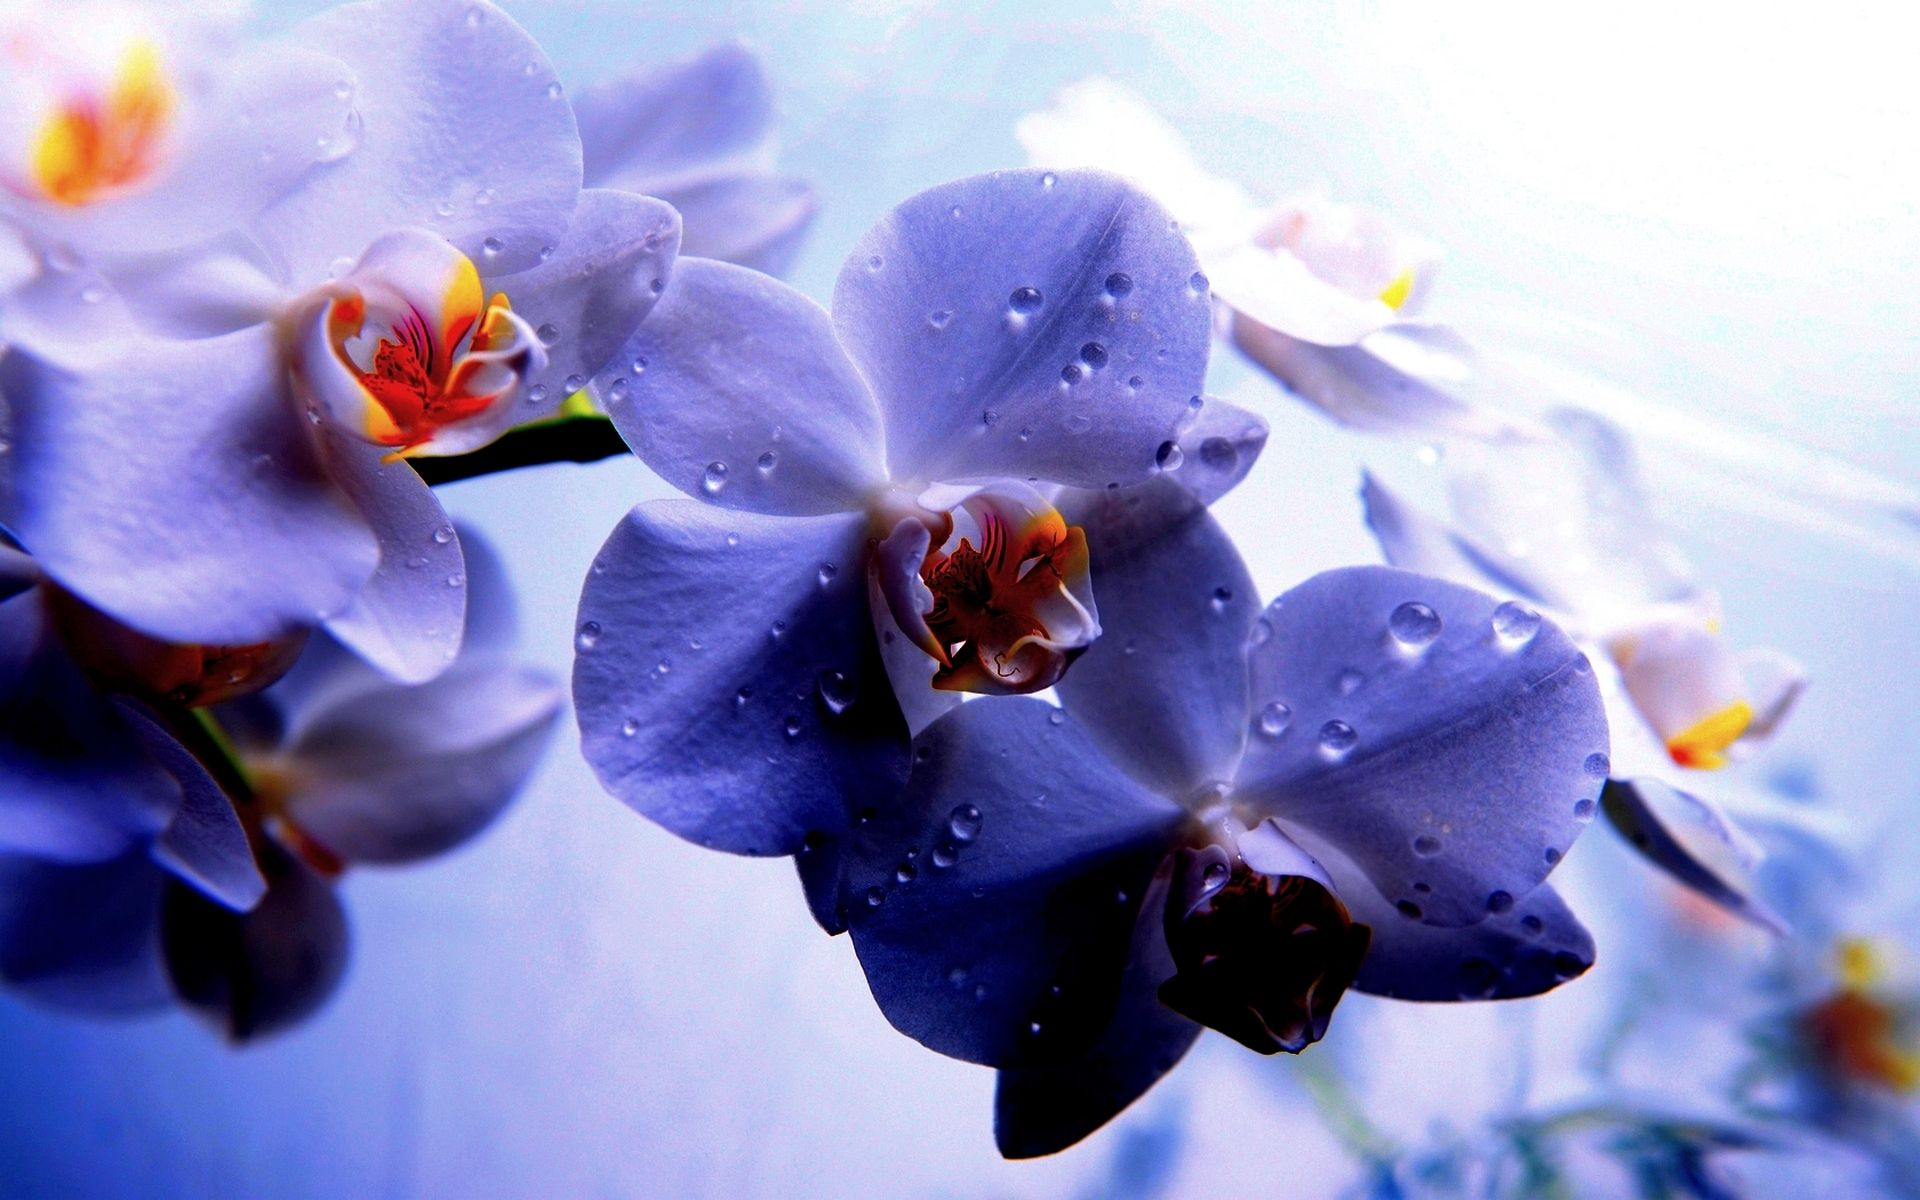 lovely orchid wallpaper 203 | Desktop Wallpaper in 2019 | Pinterest | Orchid wallpaper, Orchids ...